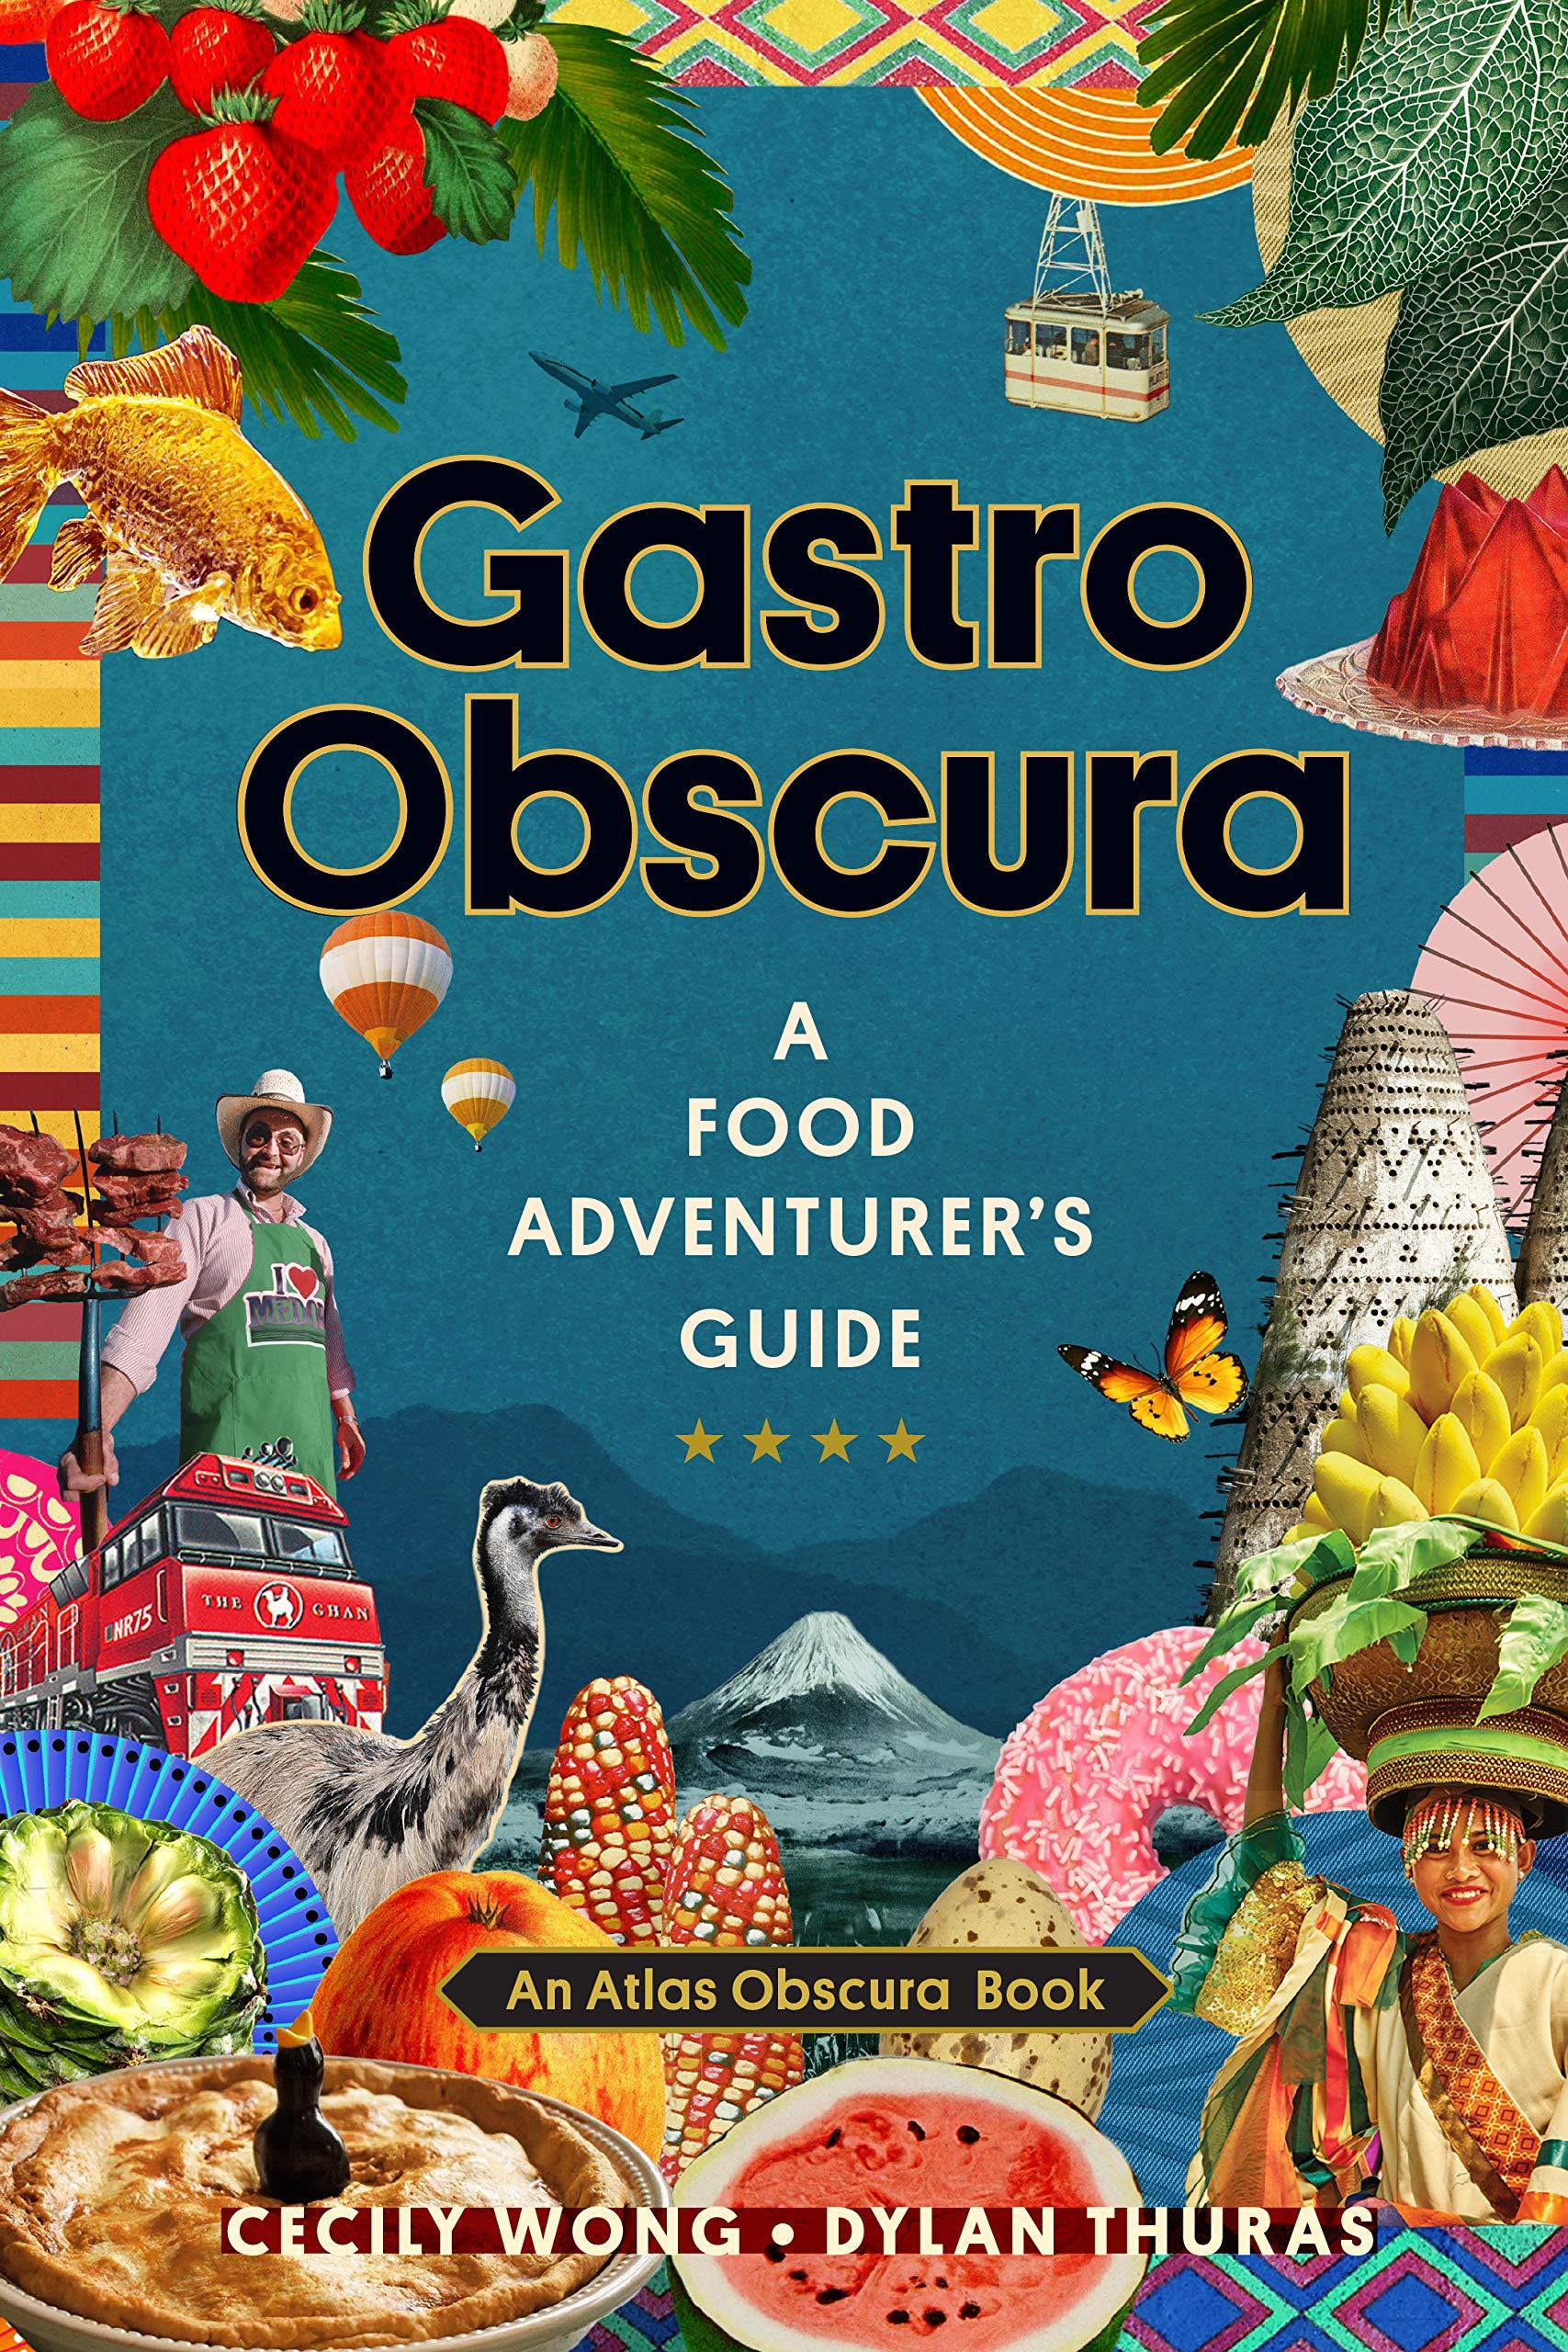 Gastro Obscura: A Food Adventurer's Guide